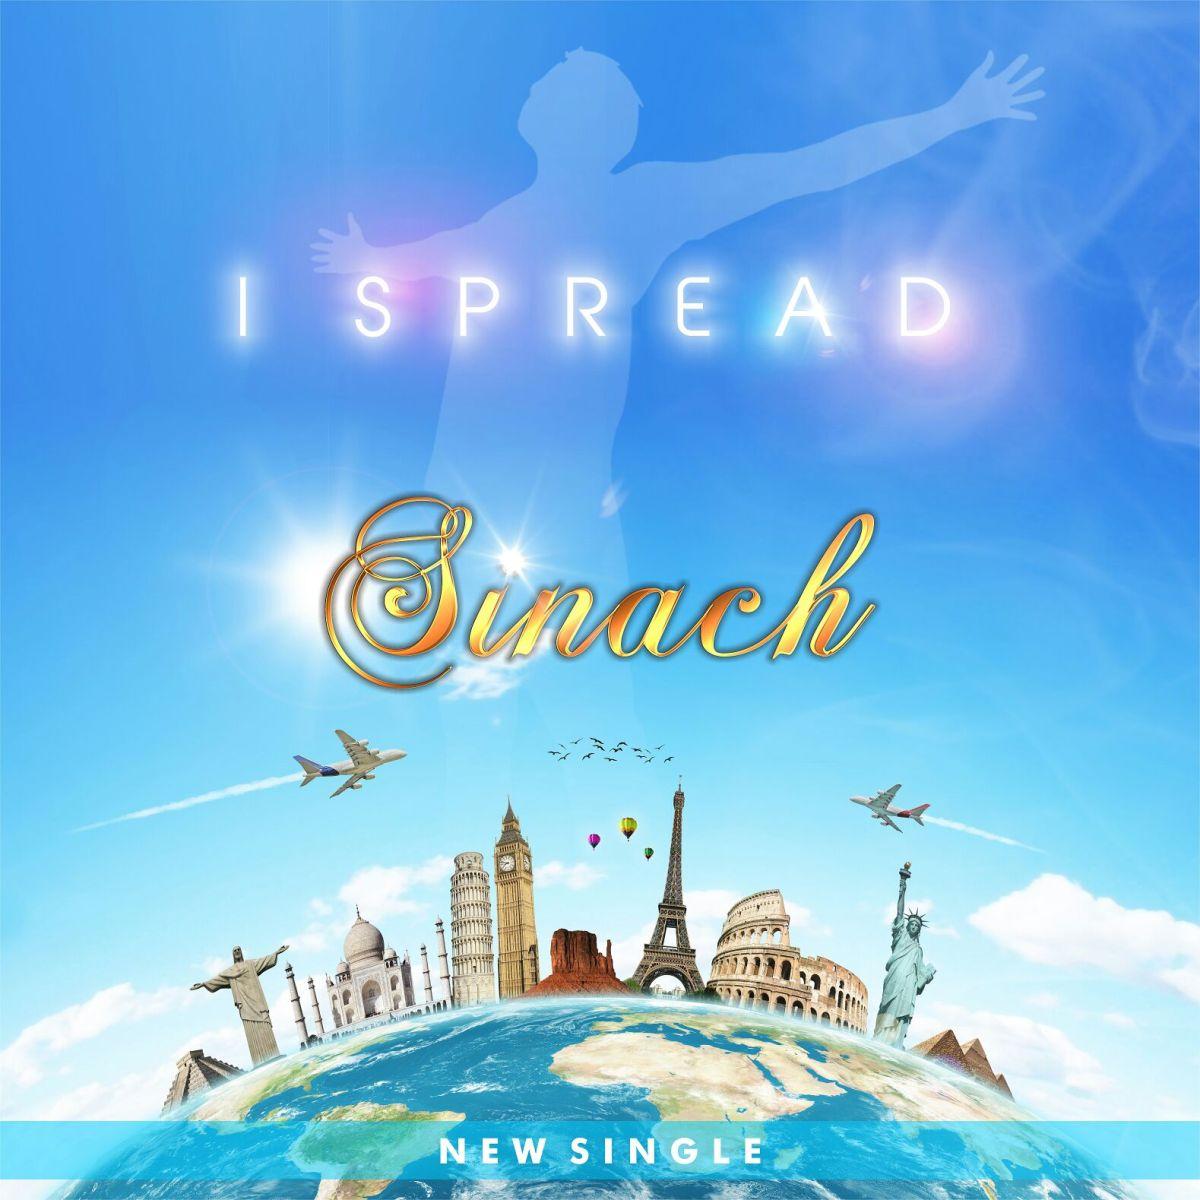 Music: Sinach - I Spread (#iSpread) | @Sinach | Download